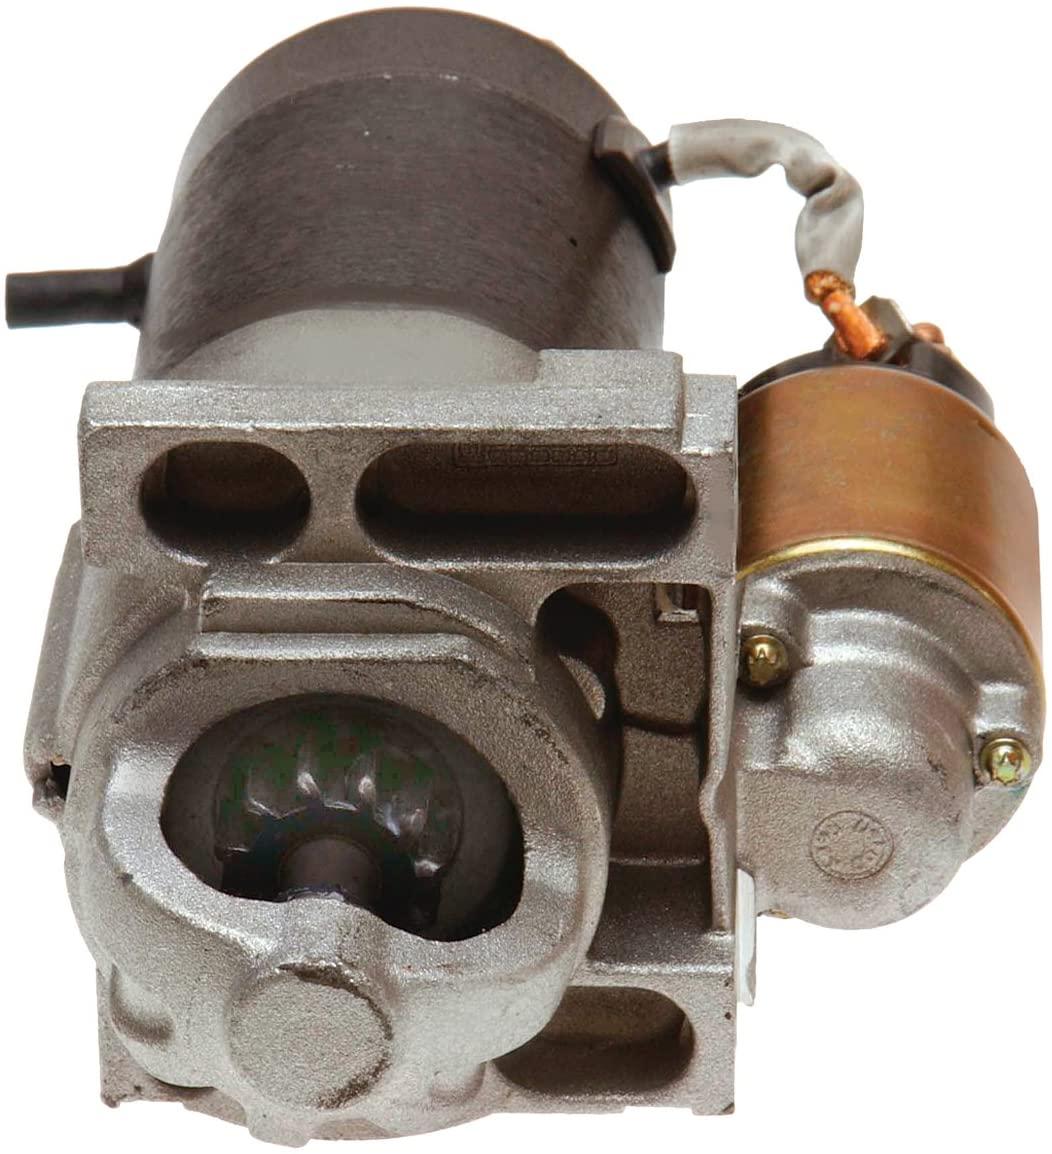 ACDelco 323-1475 GM Original Equipment Starter, Remanufactured